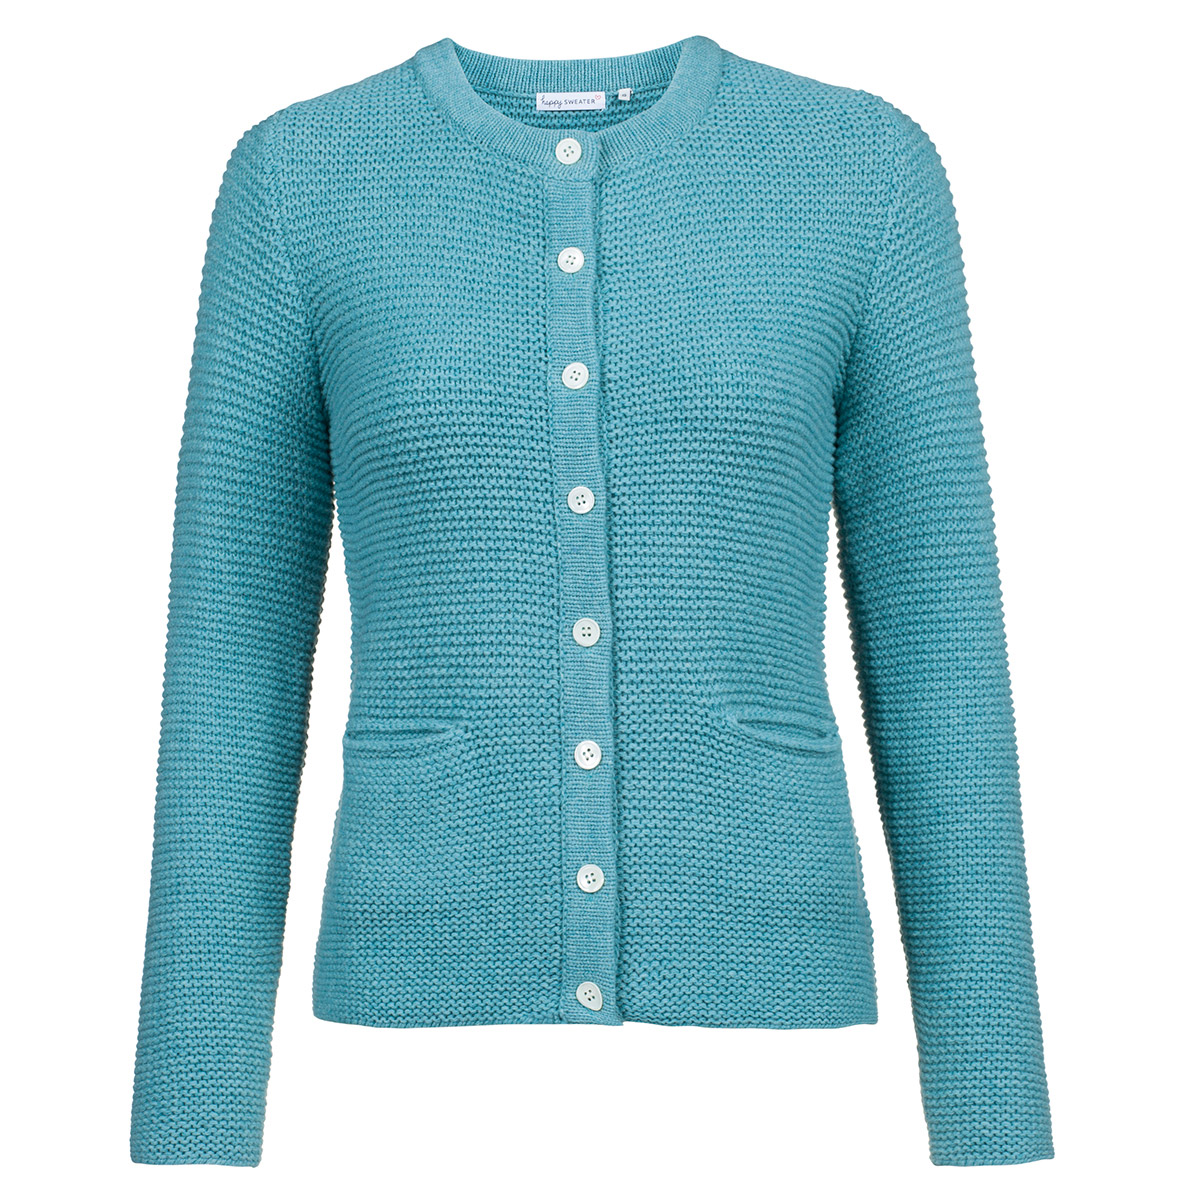 Fabrik großer Abverkauf hohe Qualität Strickjacke Damen I Handstickerei Farbe Türkis I Model: Lulu